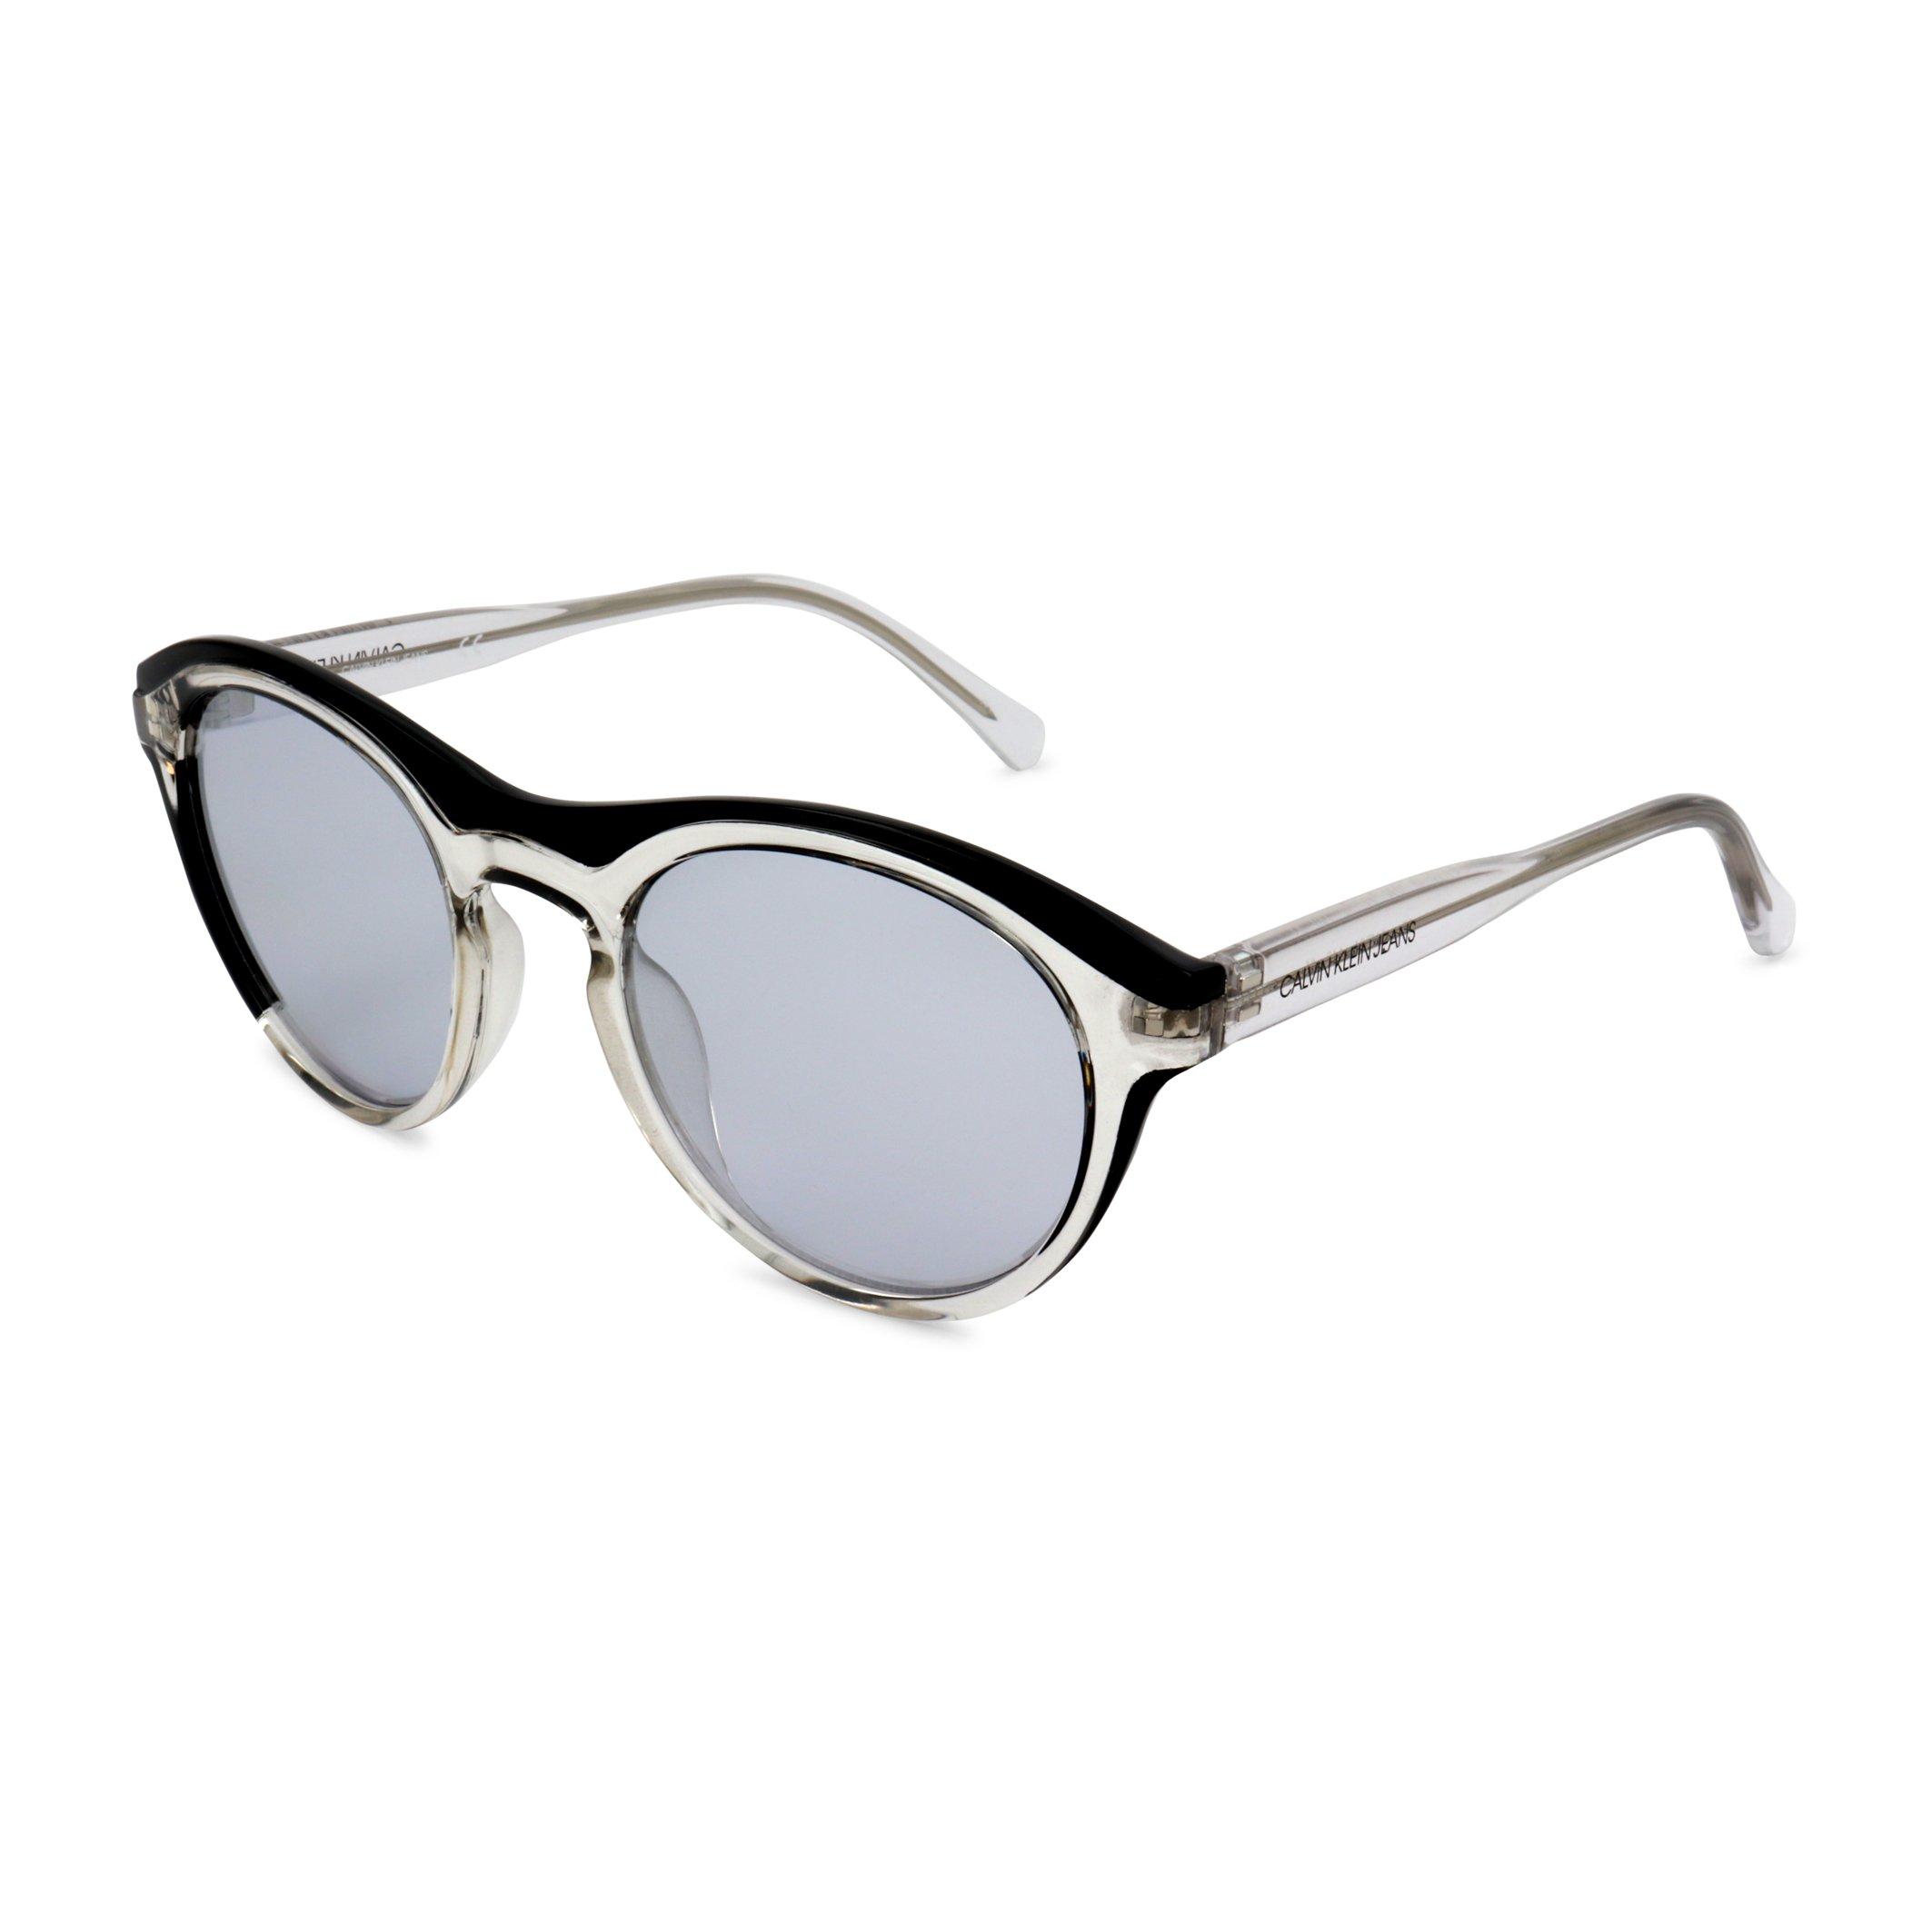 Calvin Klein Unisex Sunglasses Various Colours CKJ18503S - white NOSIZE